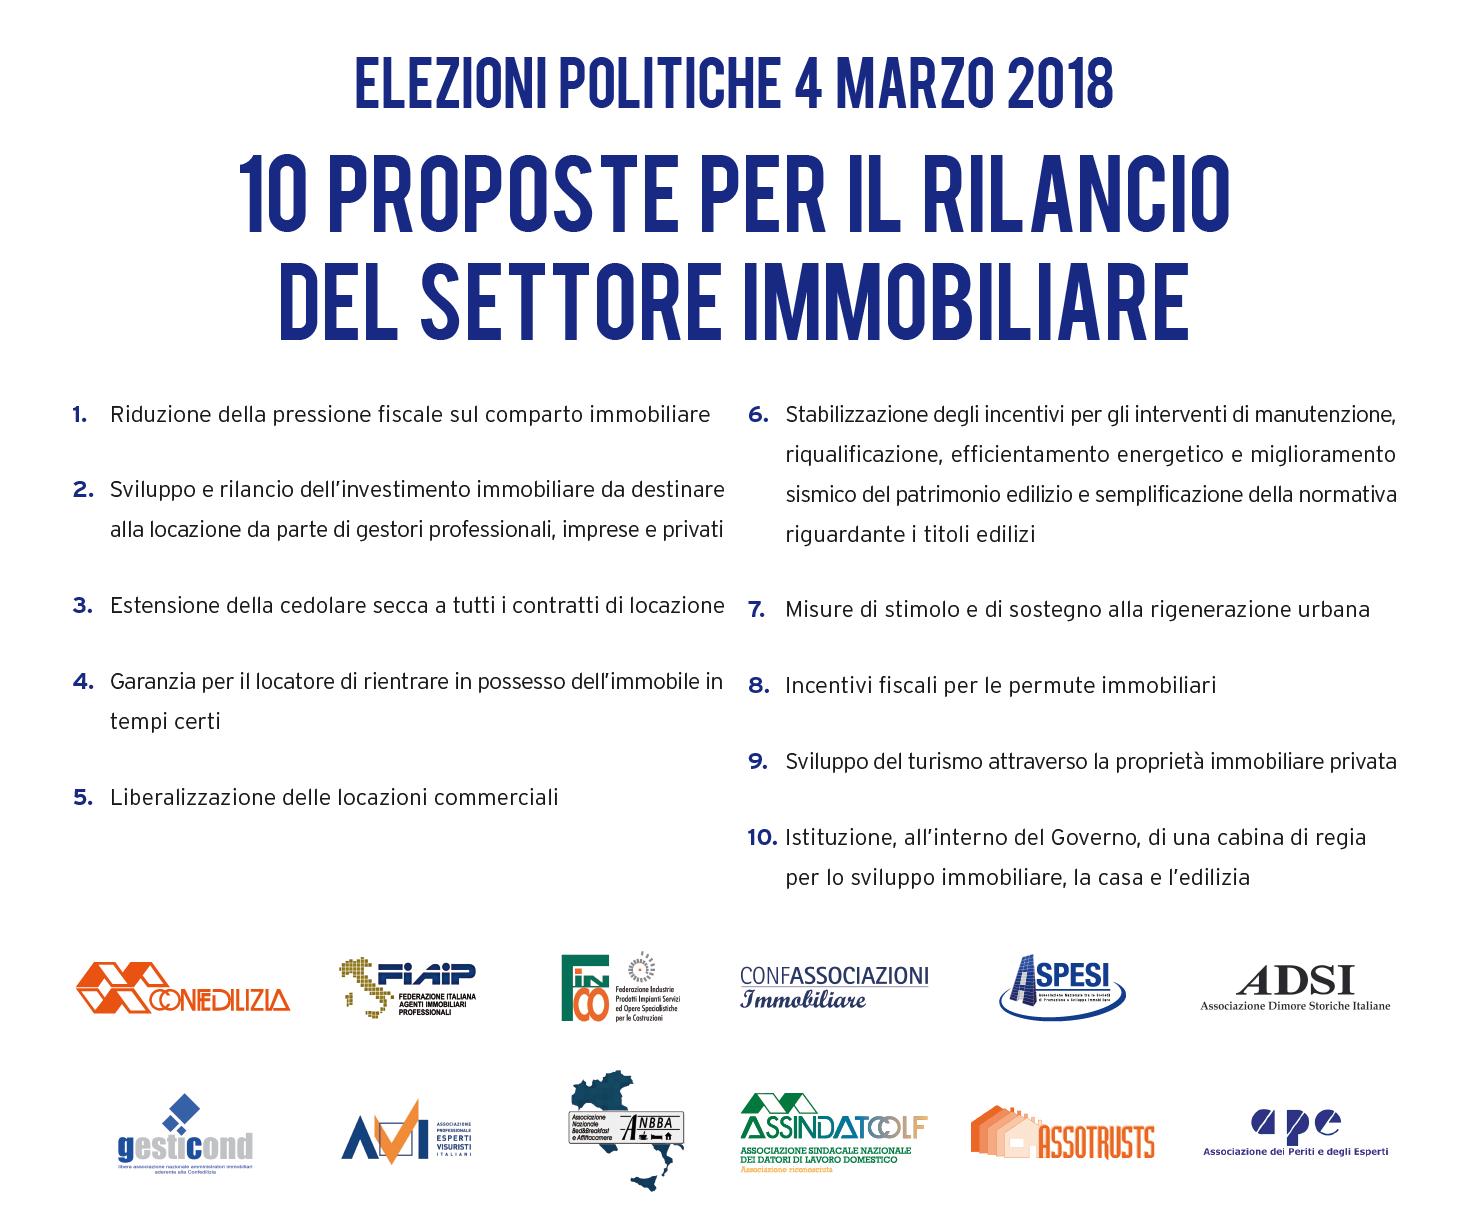 10 proposte 15.2.2018 (1)